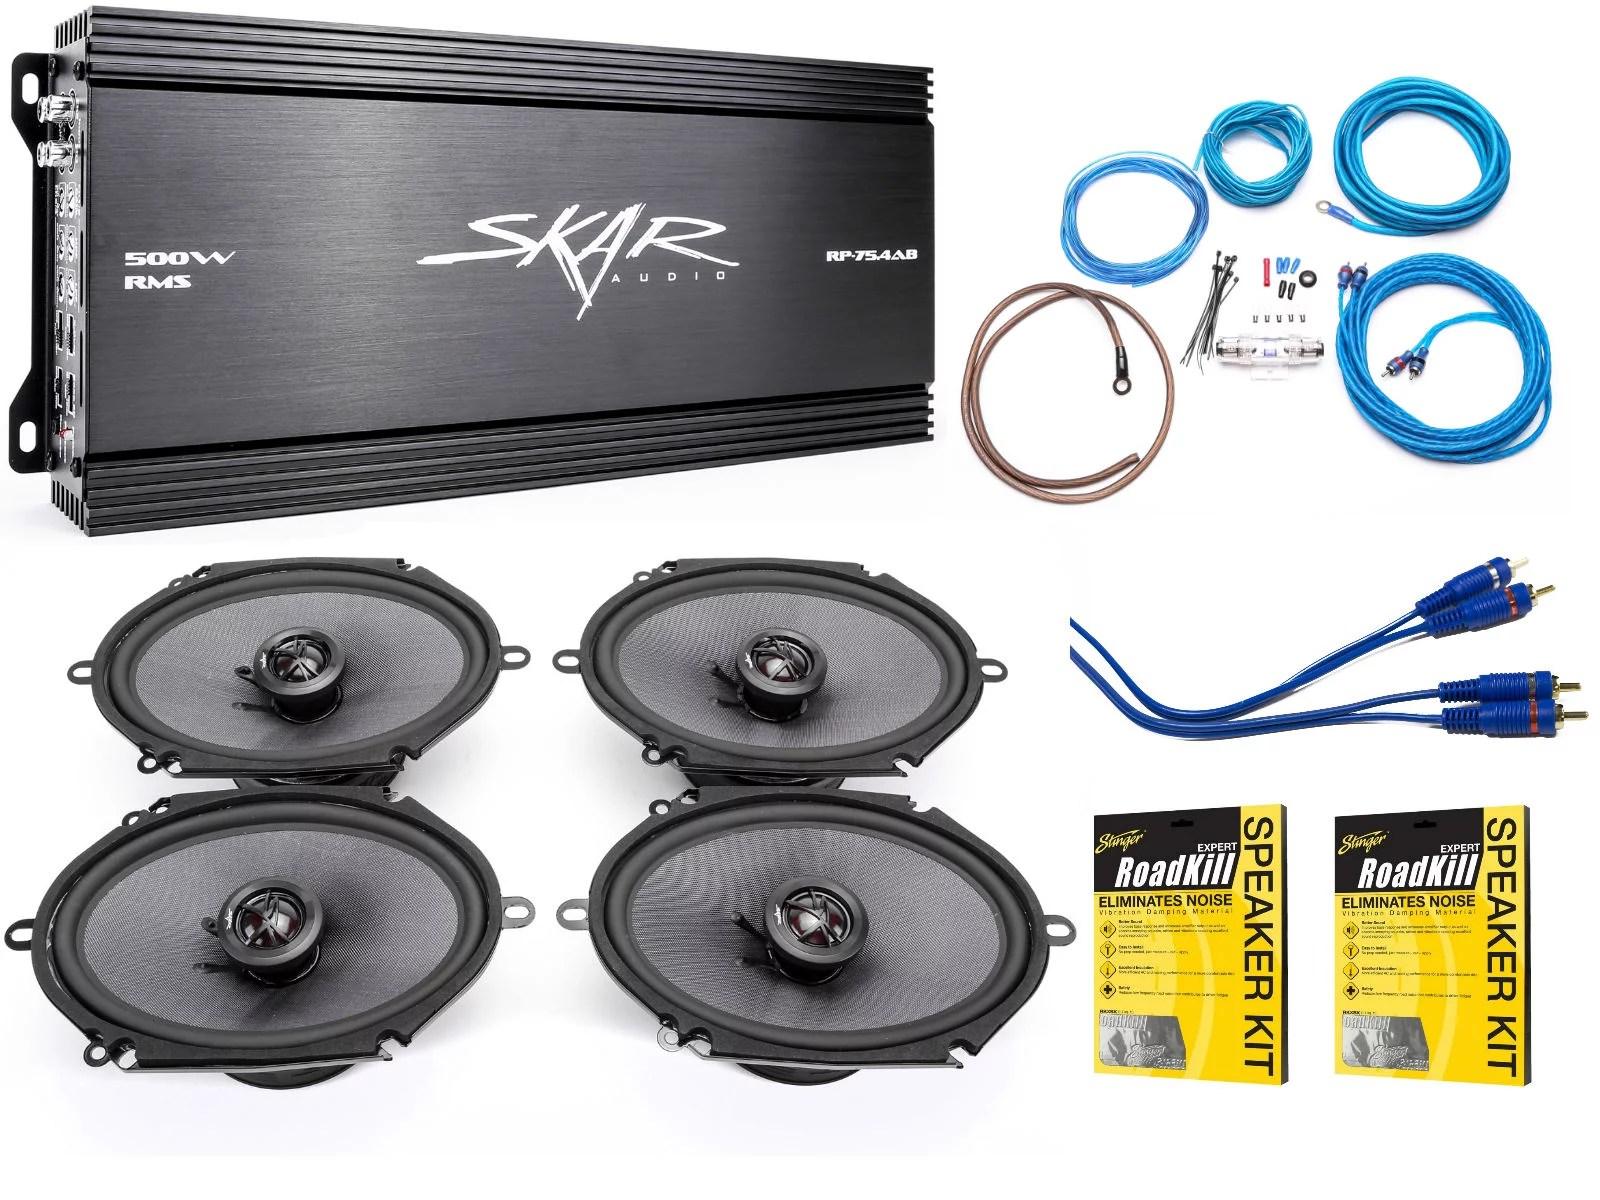 small resolution of skar audio 6 x8 complete elite speaker upgrade package with skar audio setup skar audio wiring